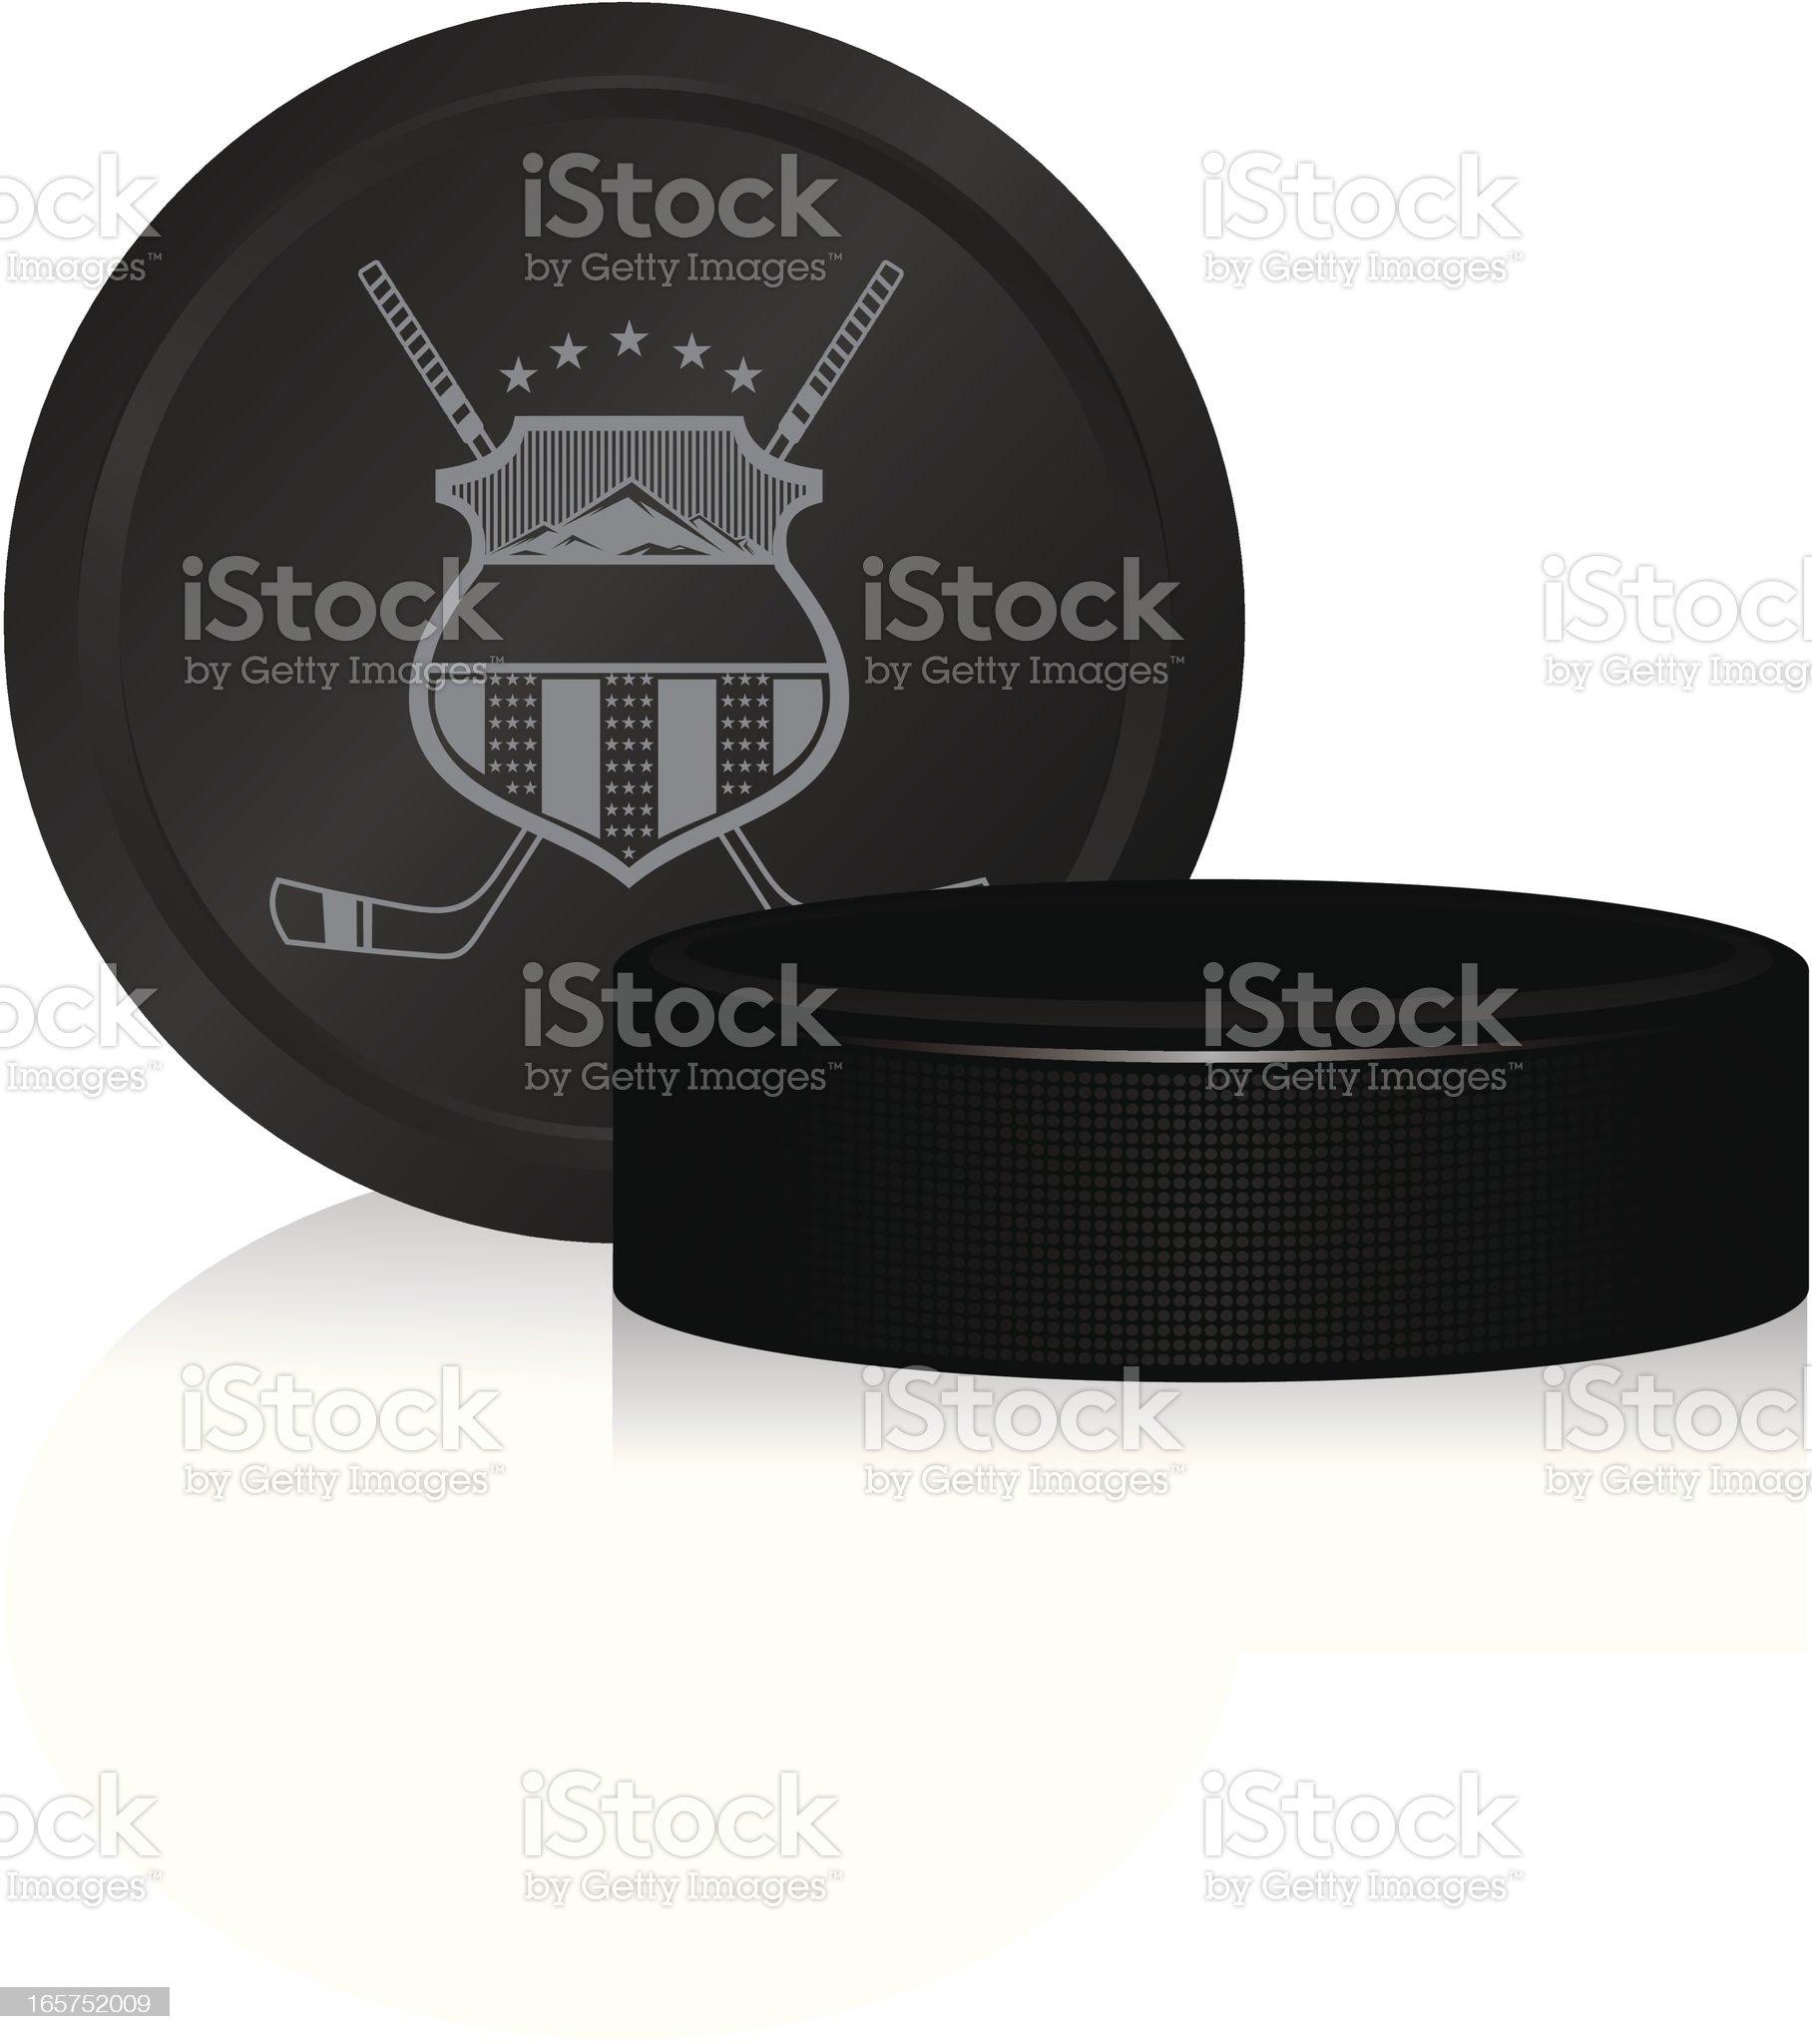 Hockey pucks royalty-free stock vector art